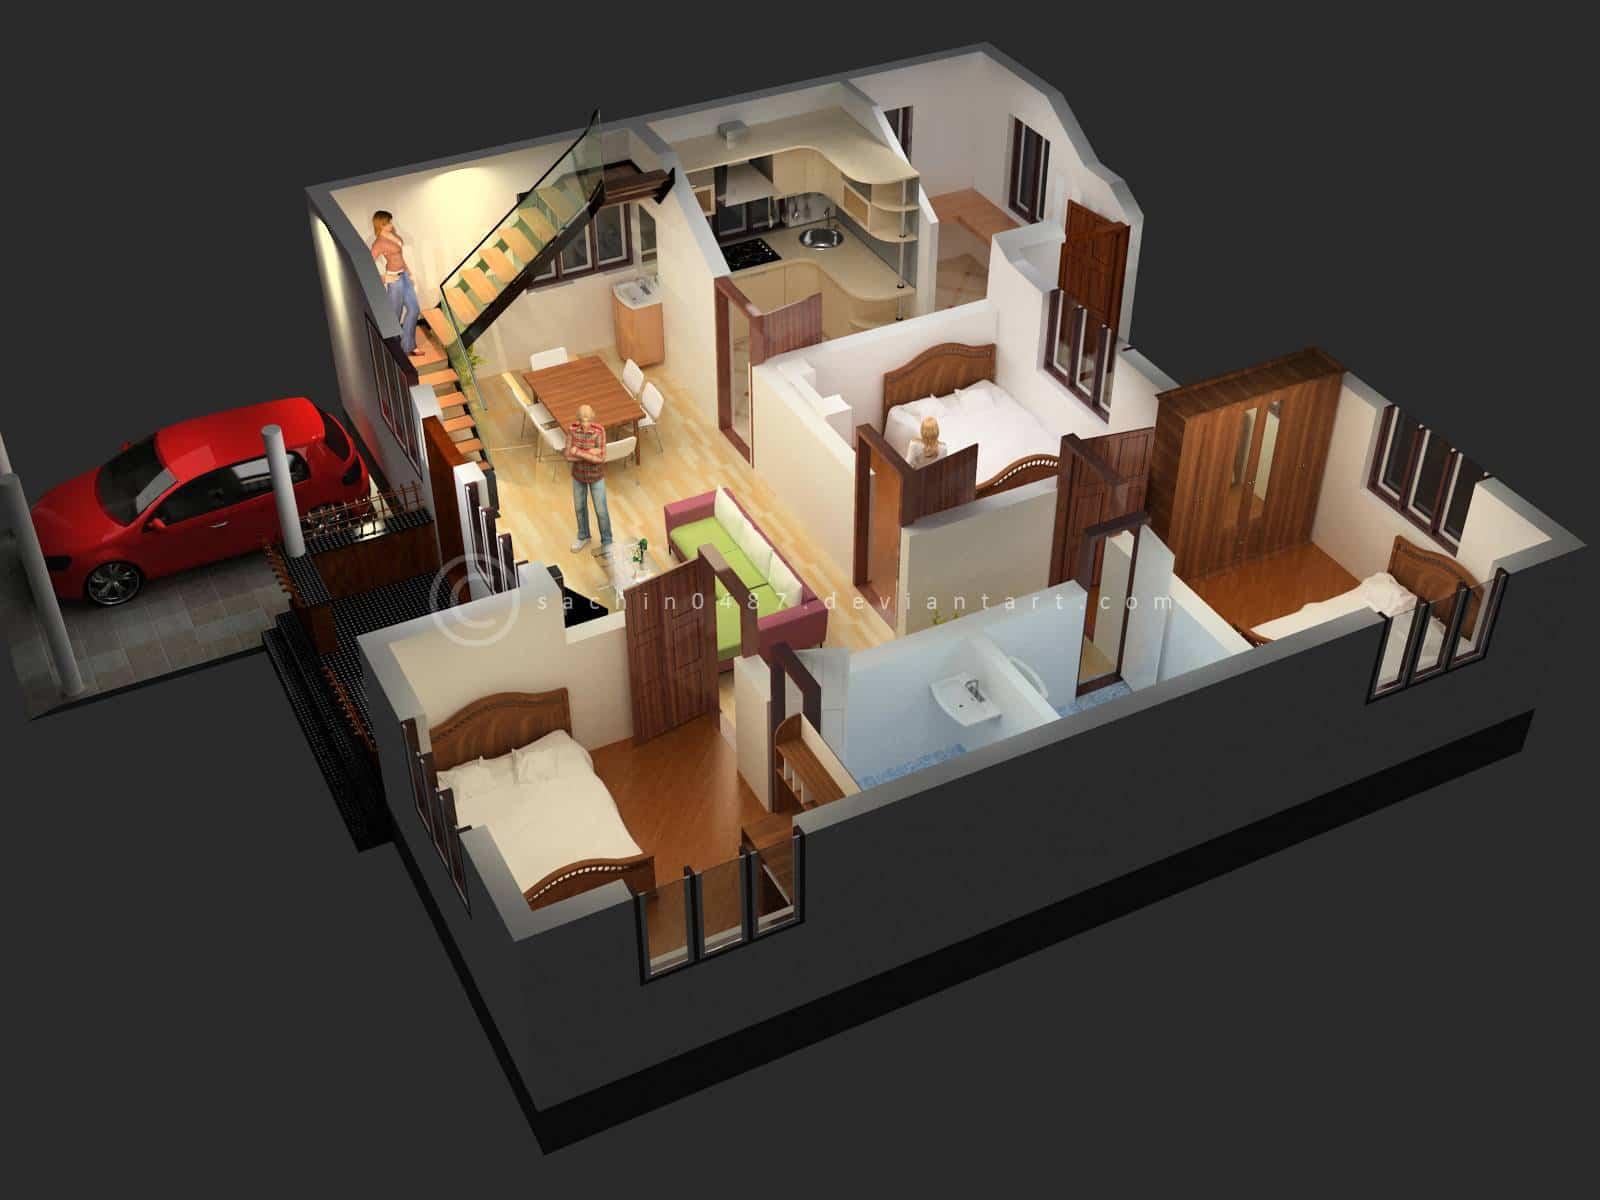 Programas de diseño de interiores online gratis para decorar